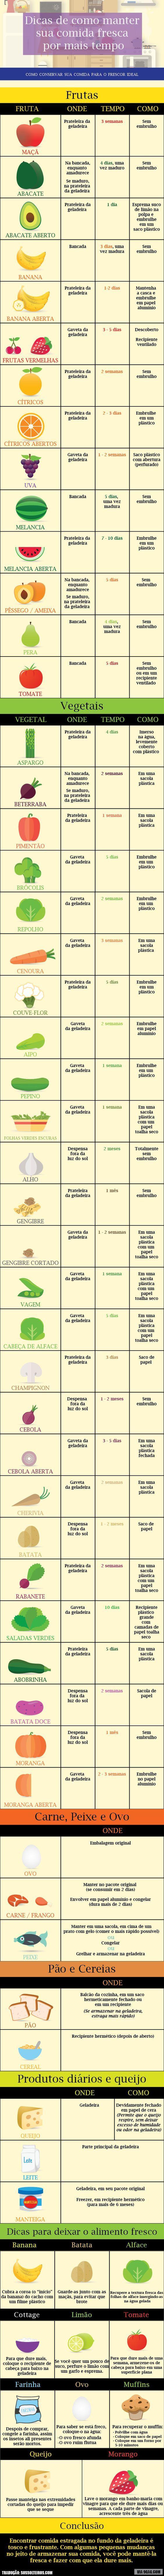 Como fazer - Conservando os alimentos